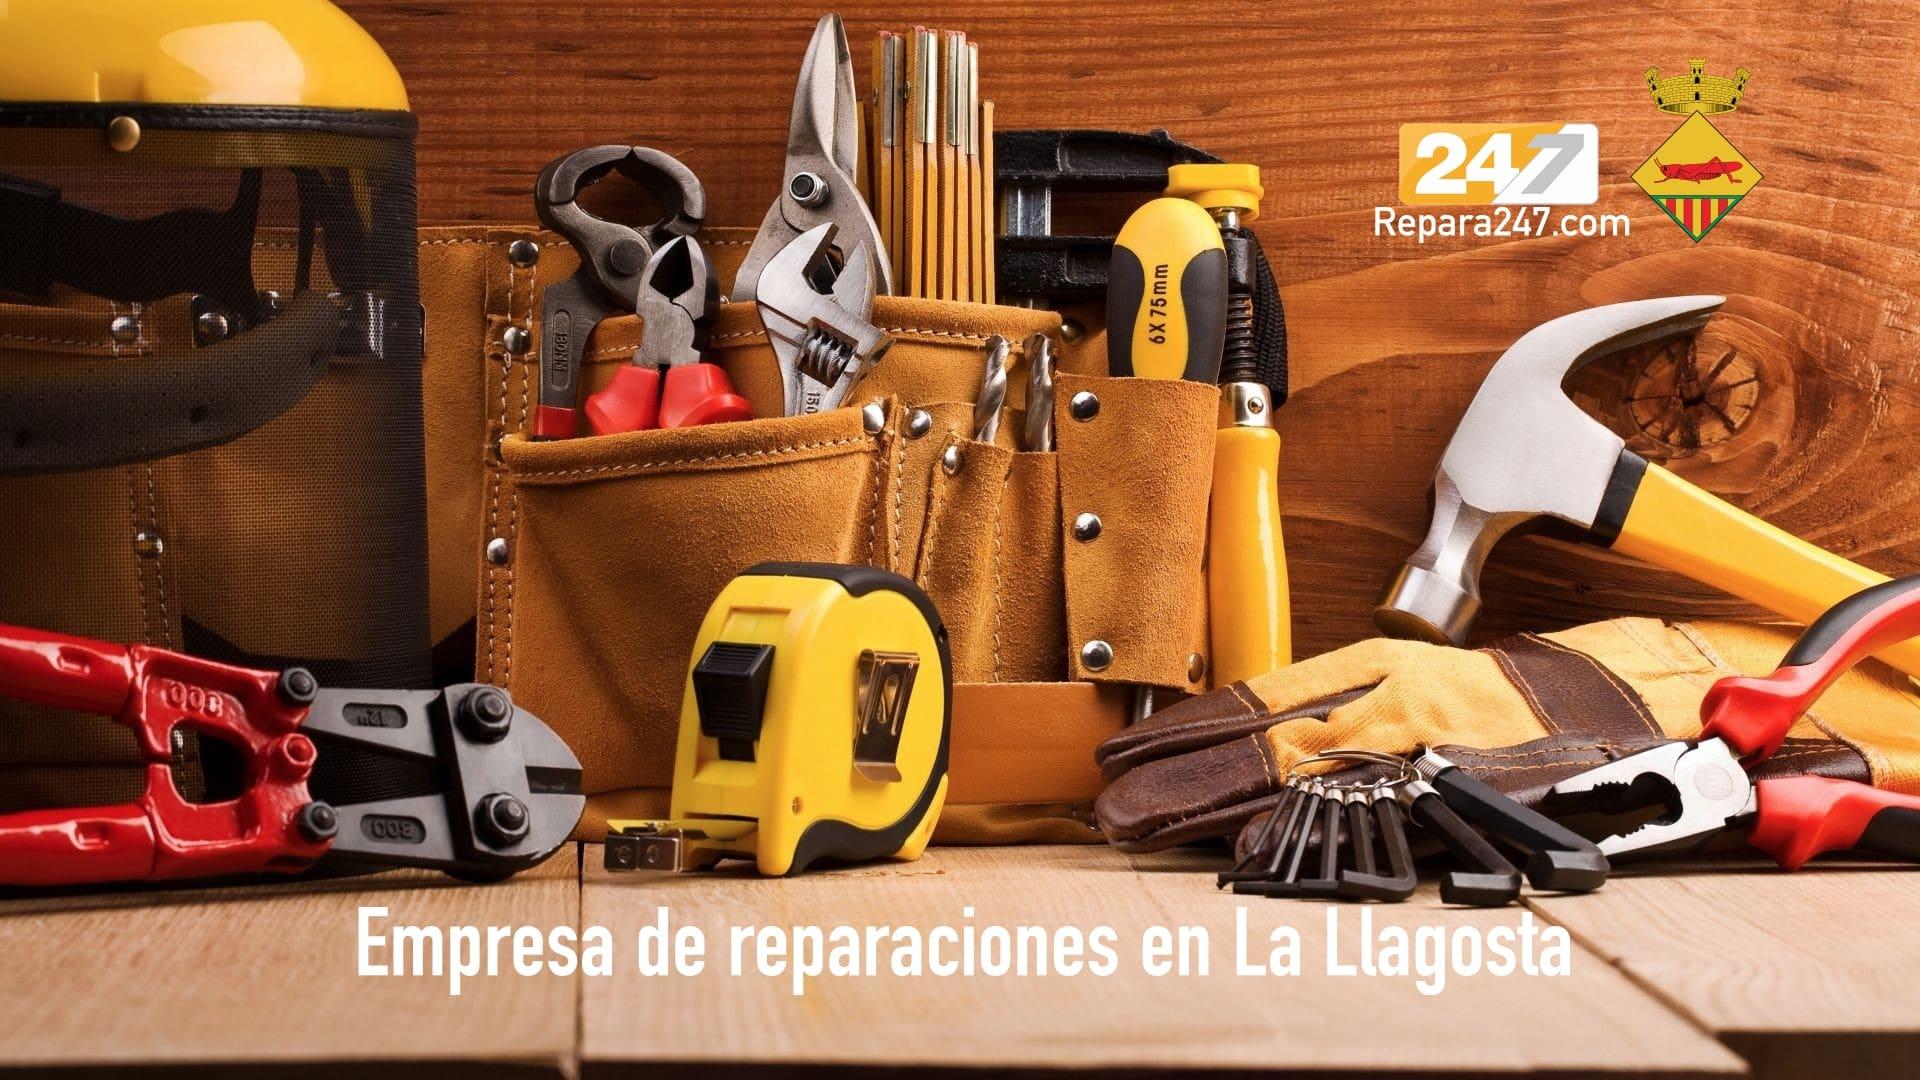 Empresa de reparaciones en La Llagosta